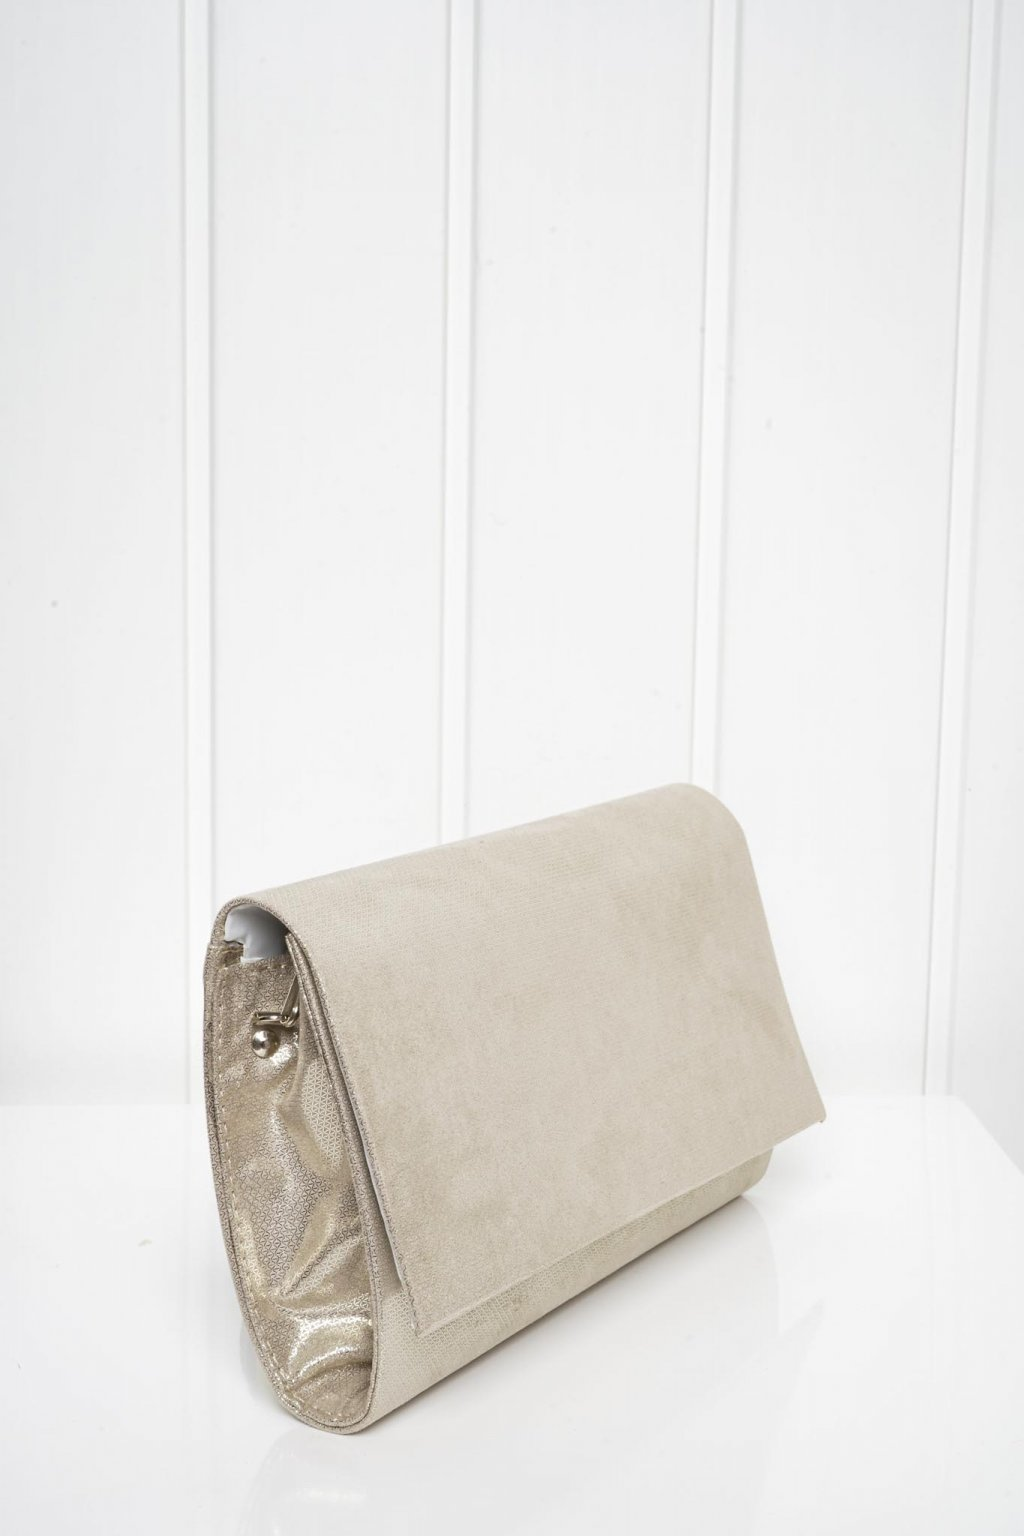 Kabelka, crossbody, ruksak, shopping bag, shopperka, 585